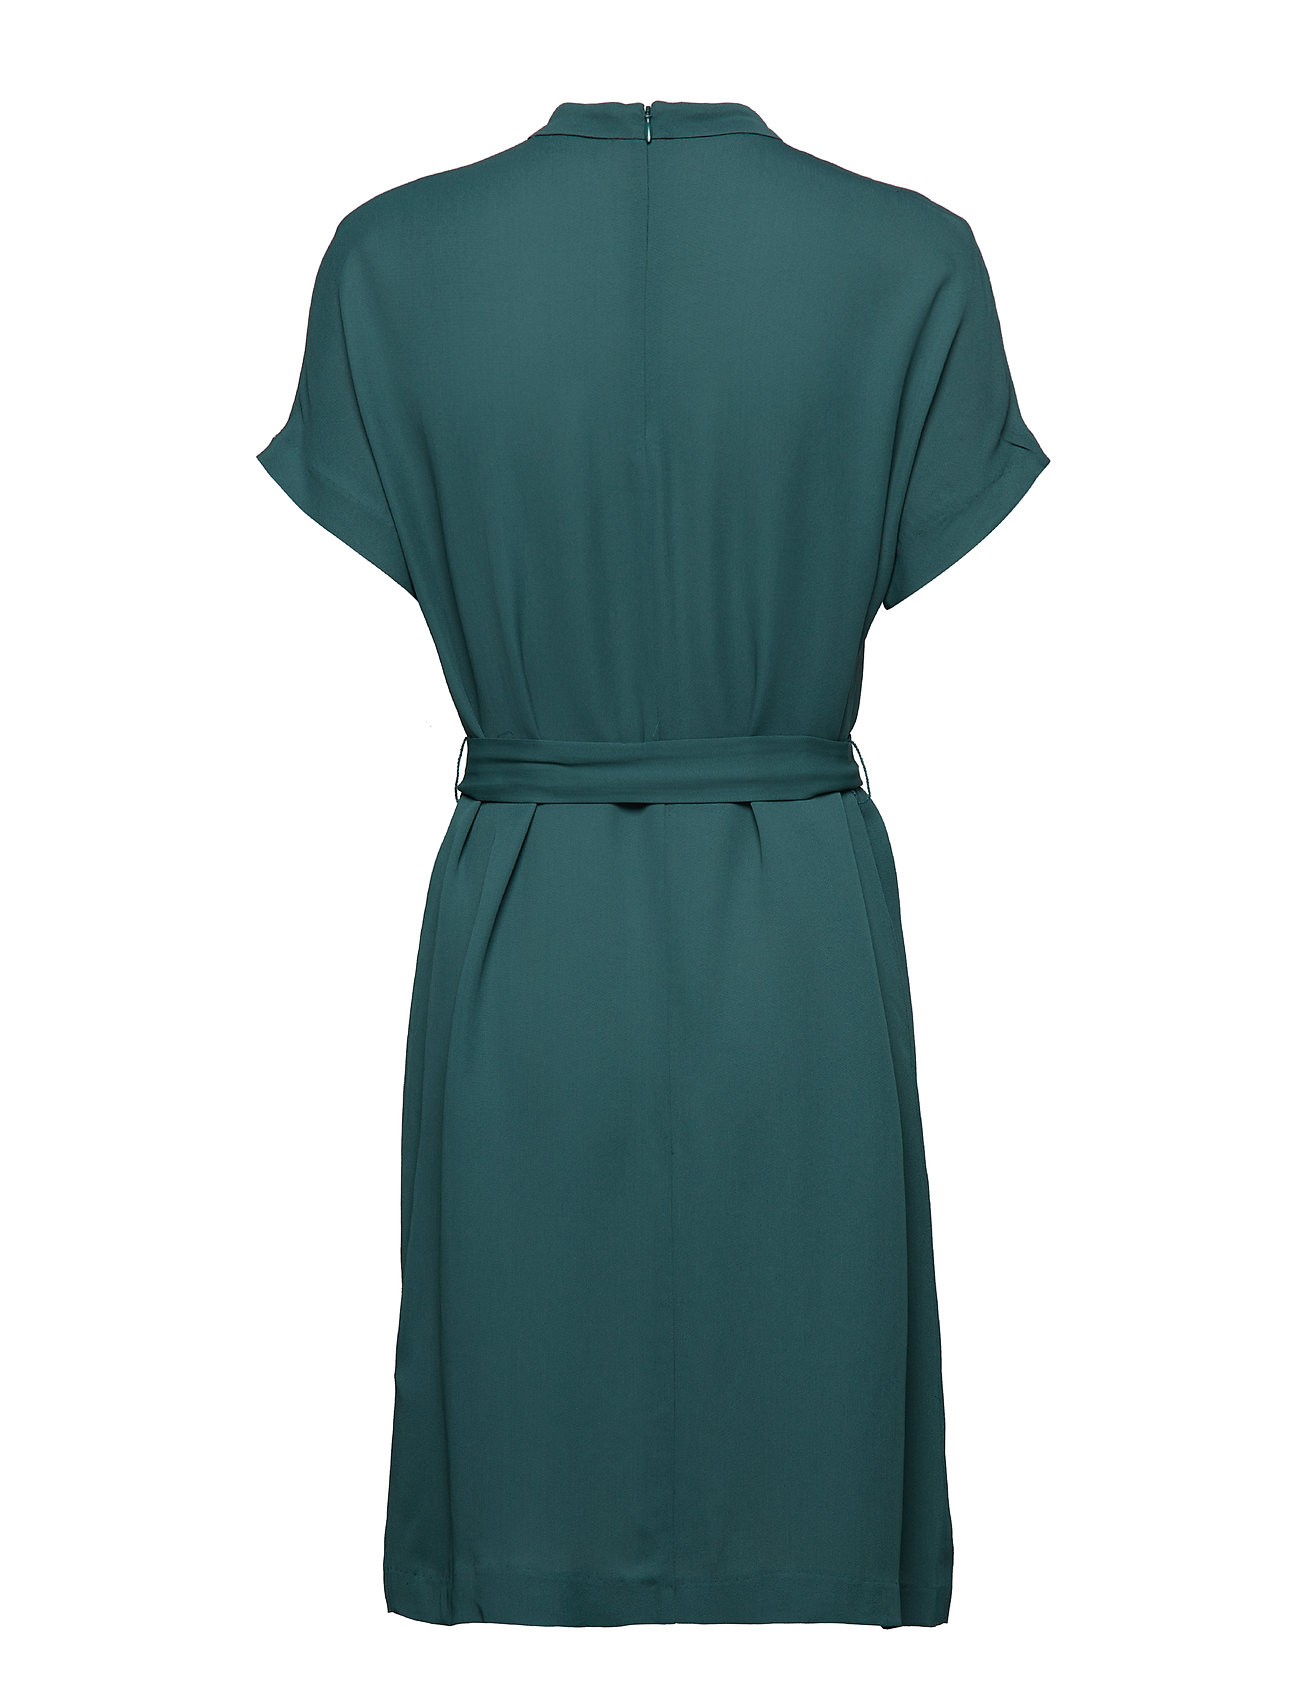 57a0349f Kimberly Ss Dress 6616 midikjoler fra Samsøe & Samsøe til dame i ...